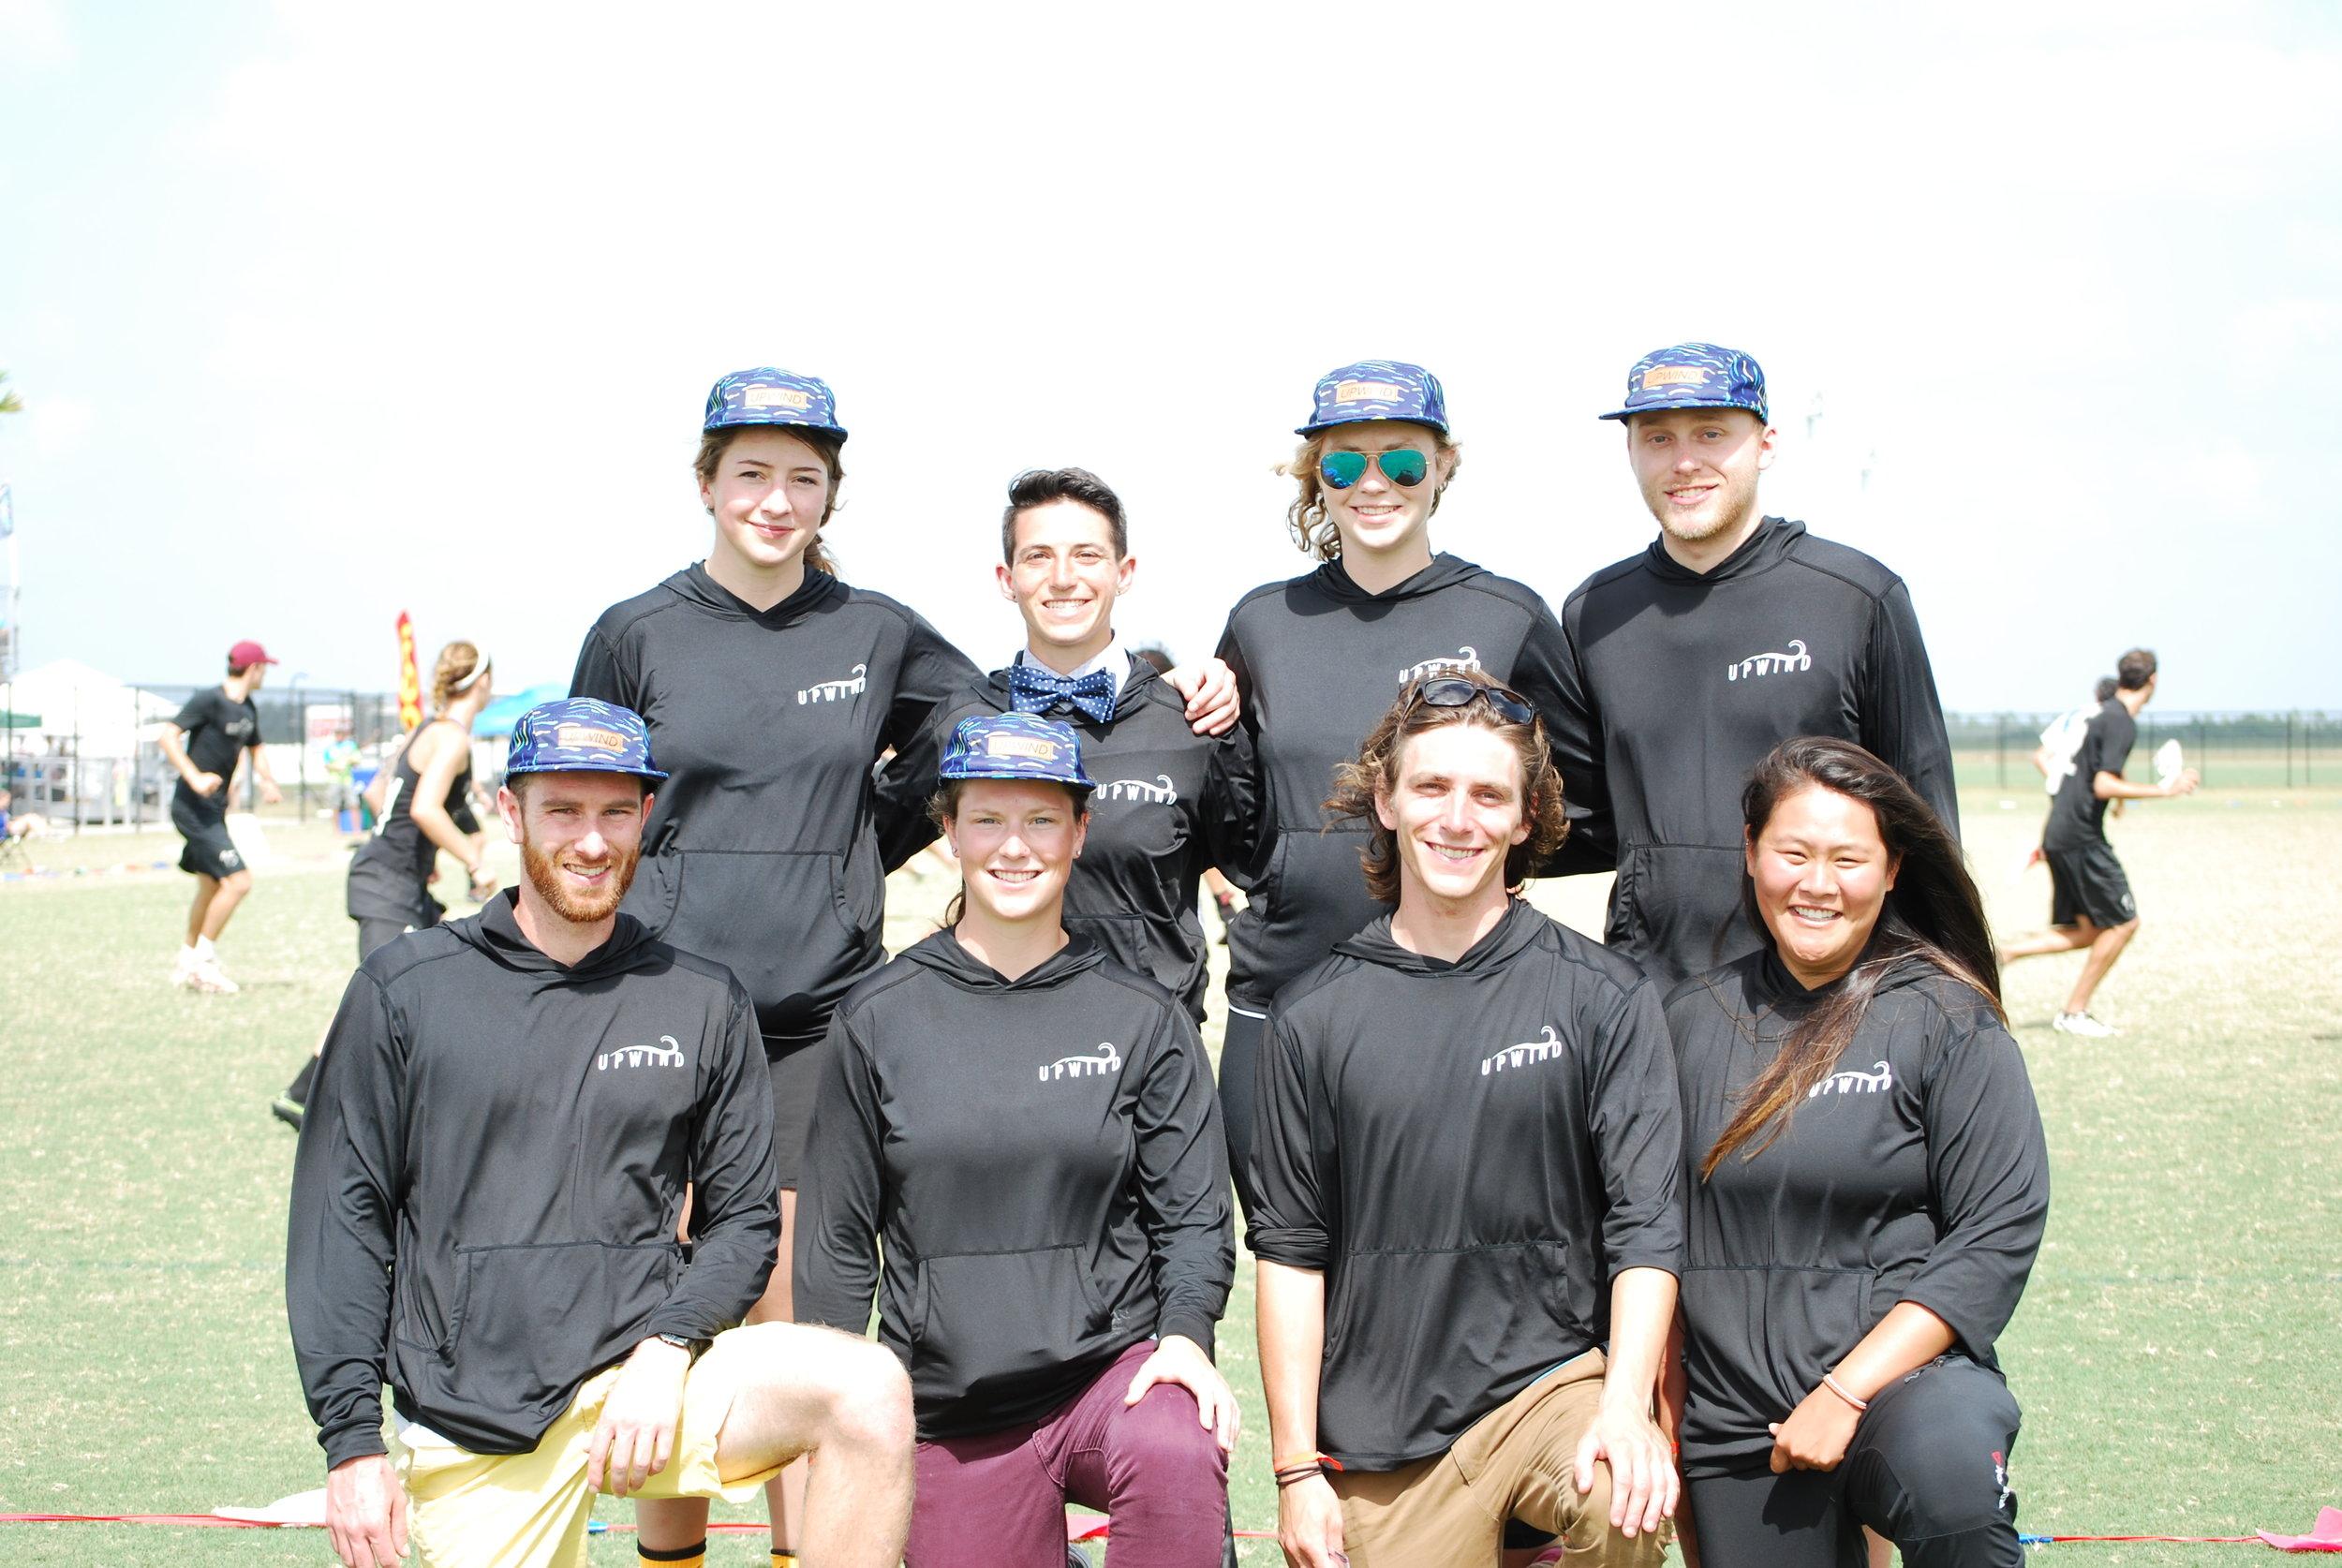 The #UpwindNats crew. (Jesse Shofner)